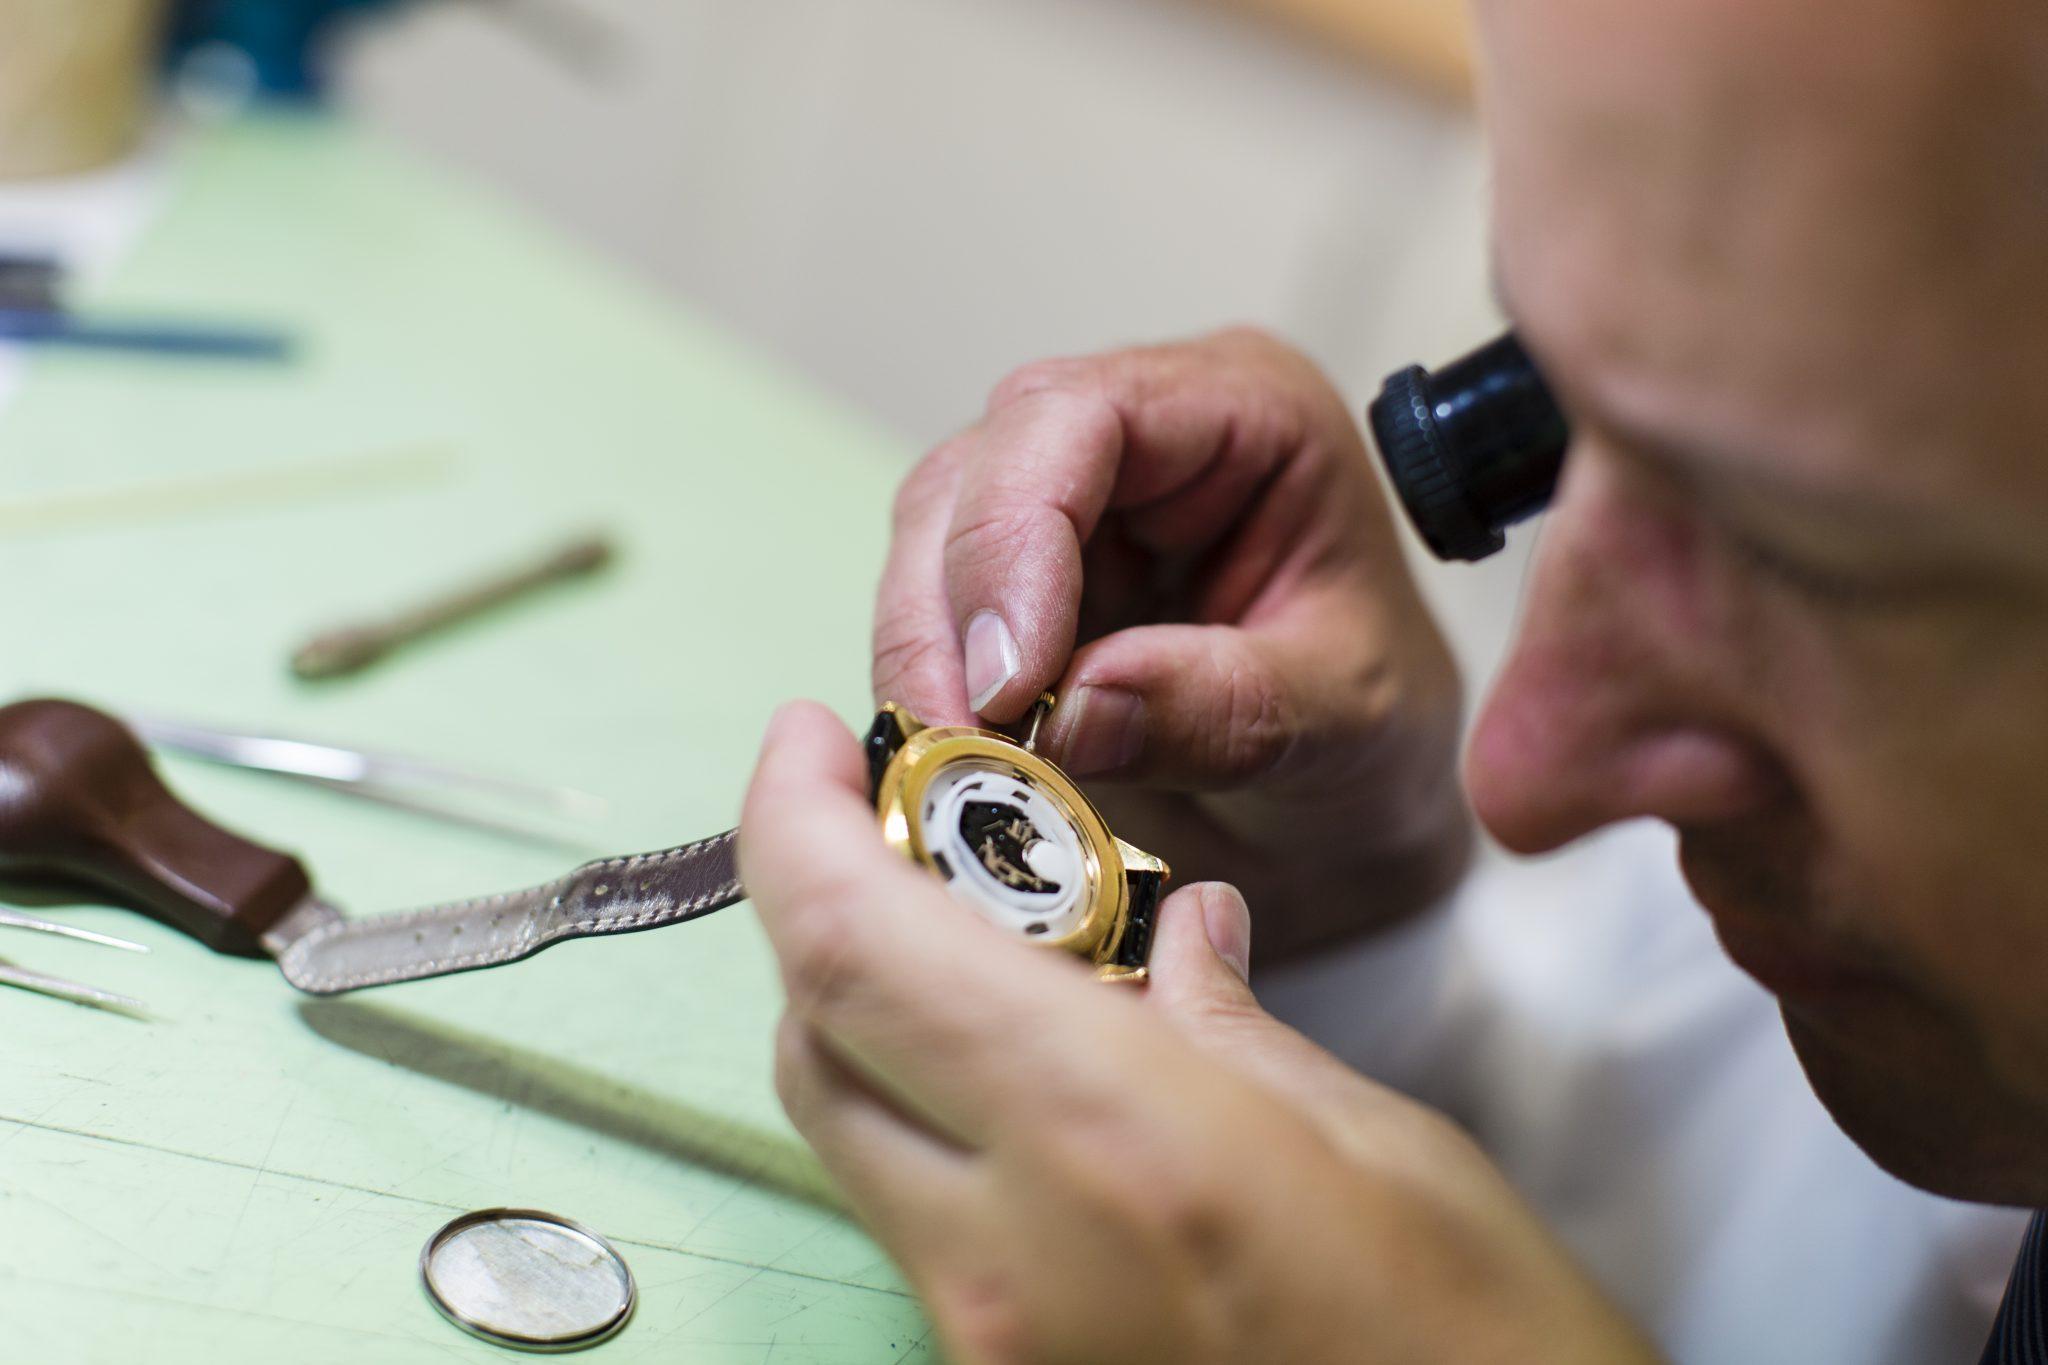 man repairing watch